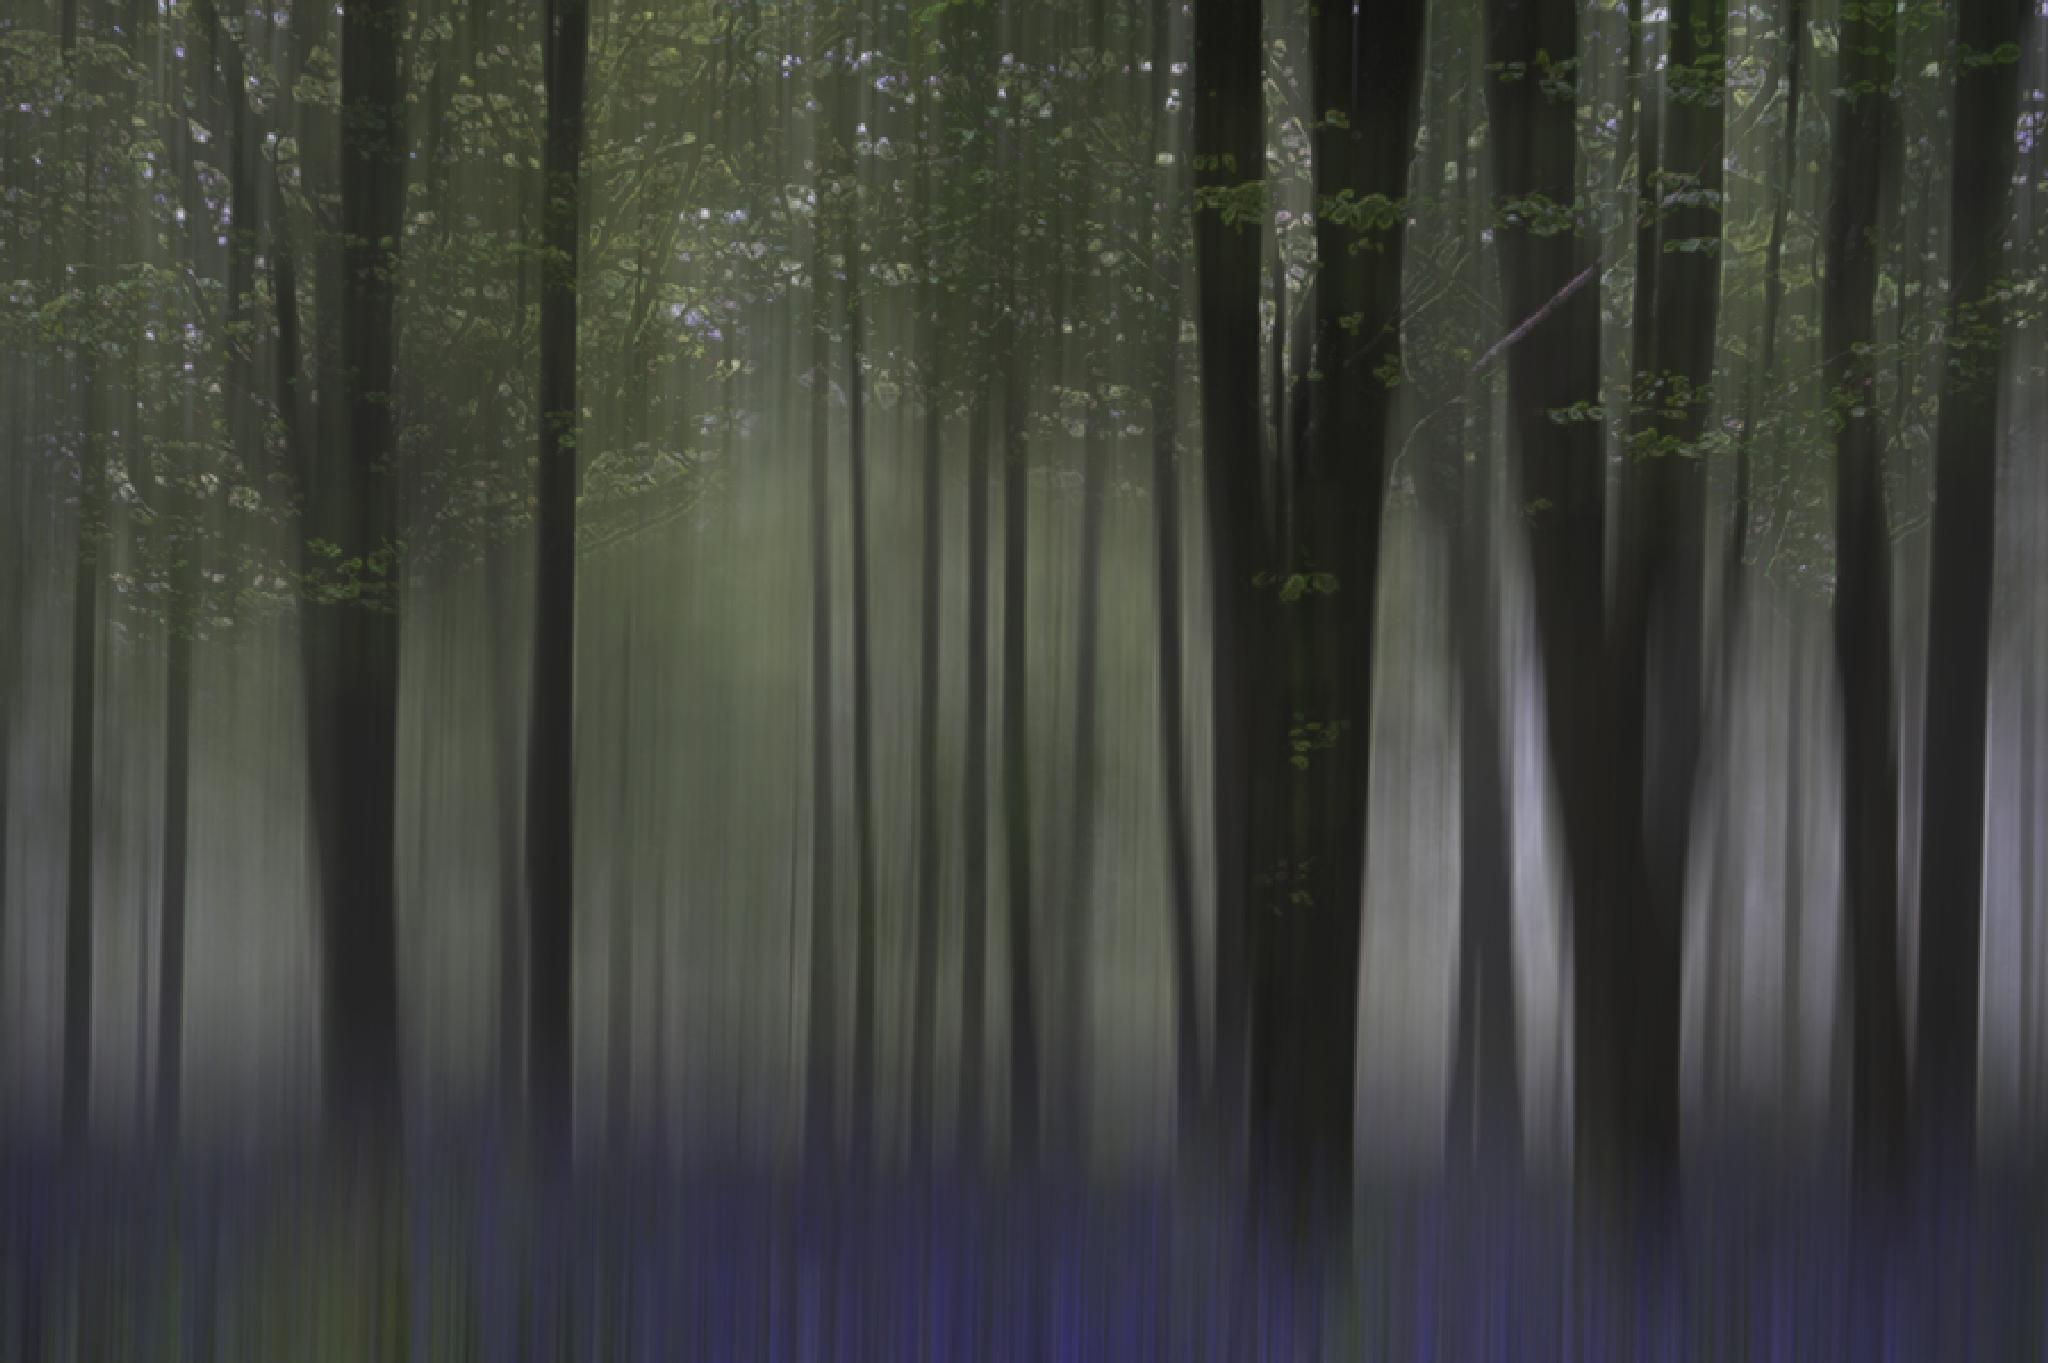 delcombe wood by jo stephen